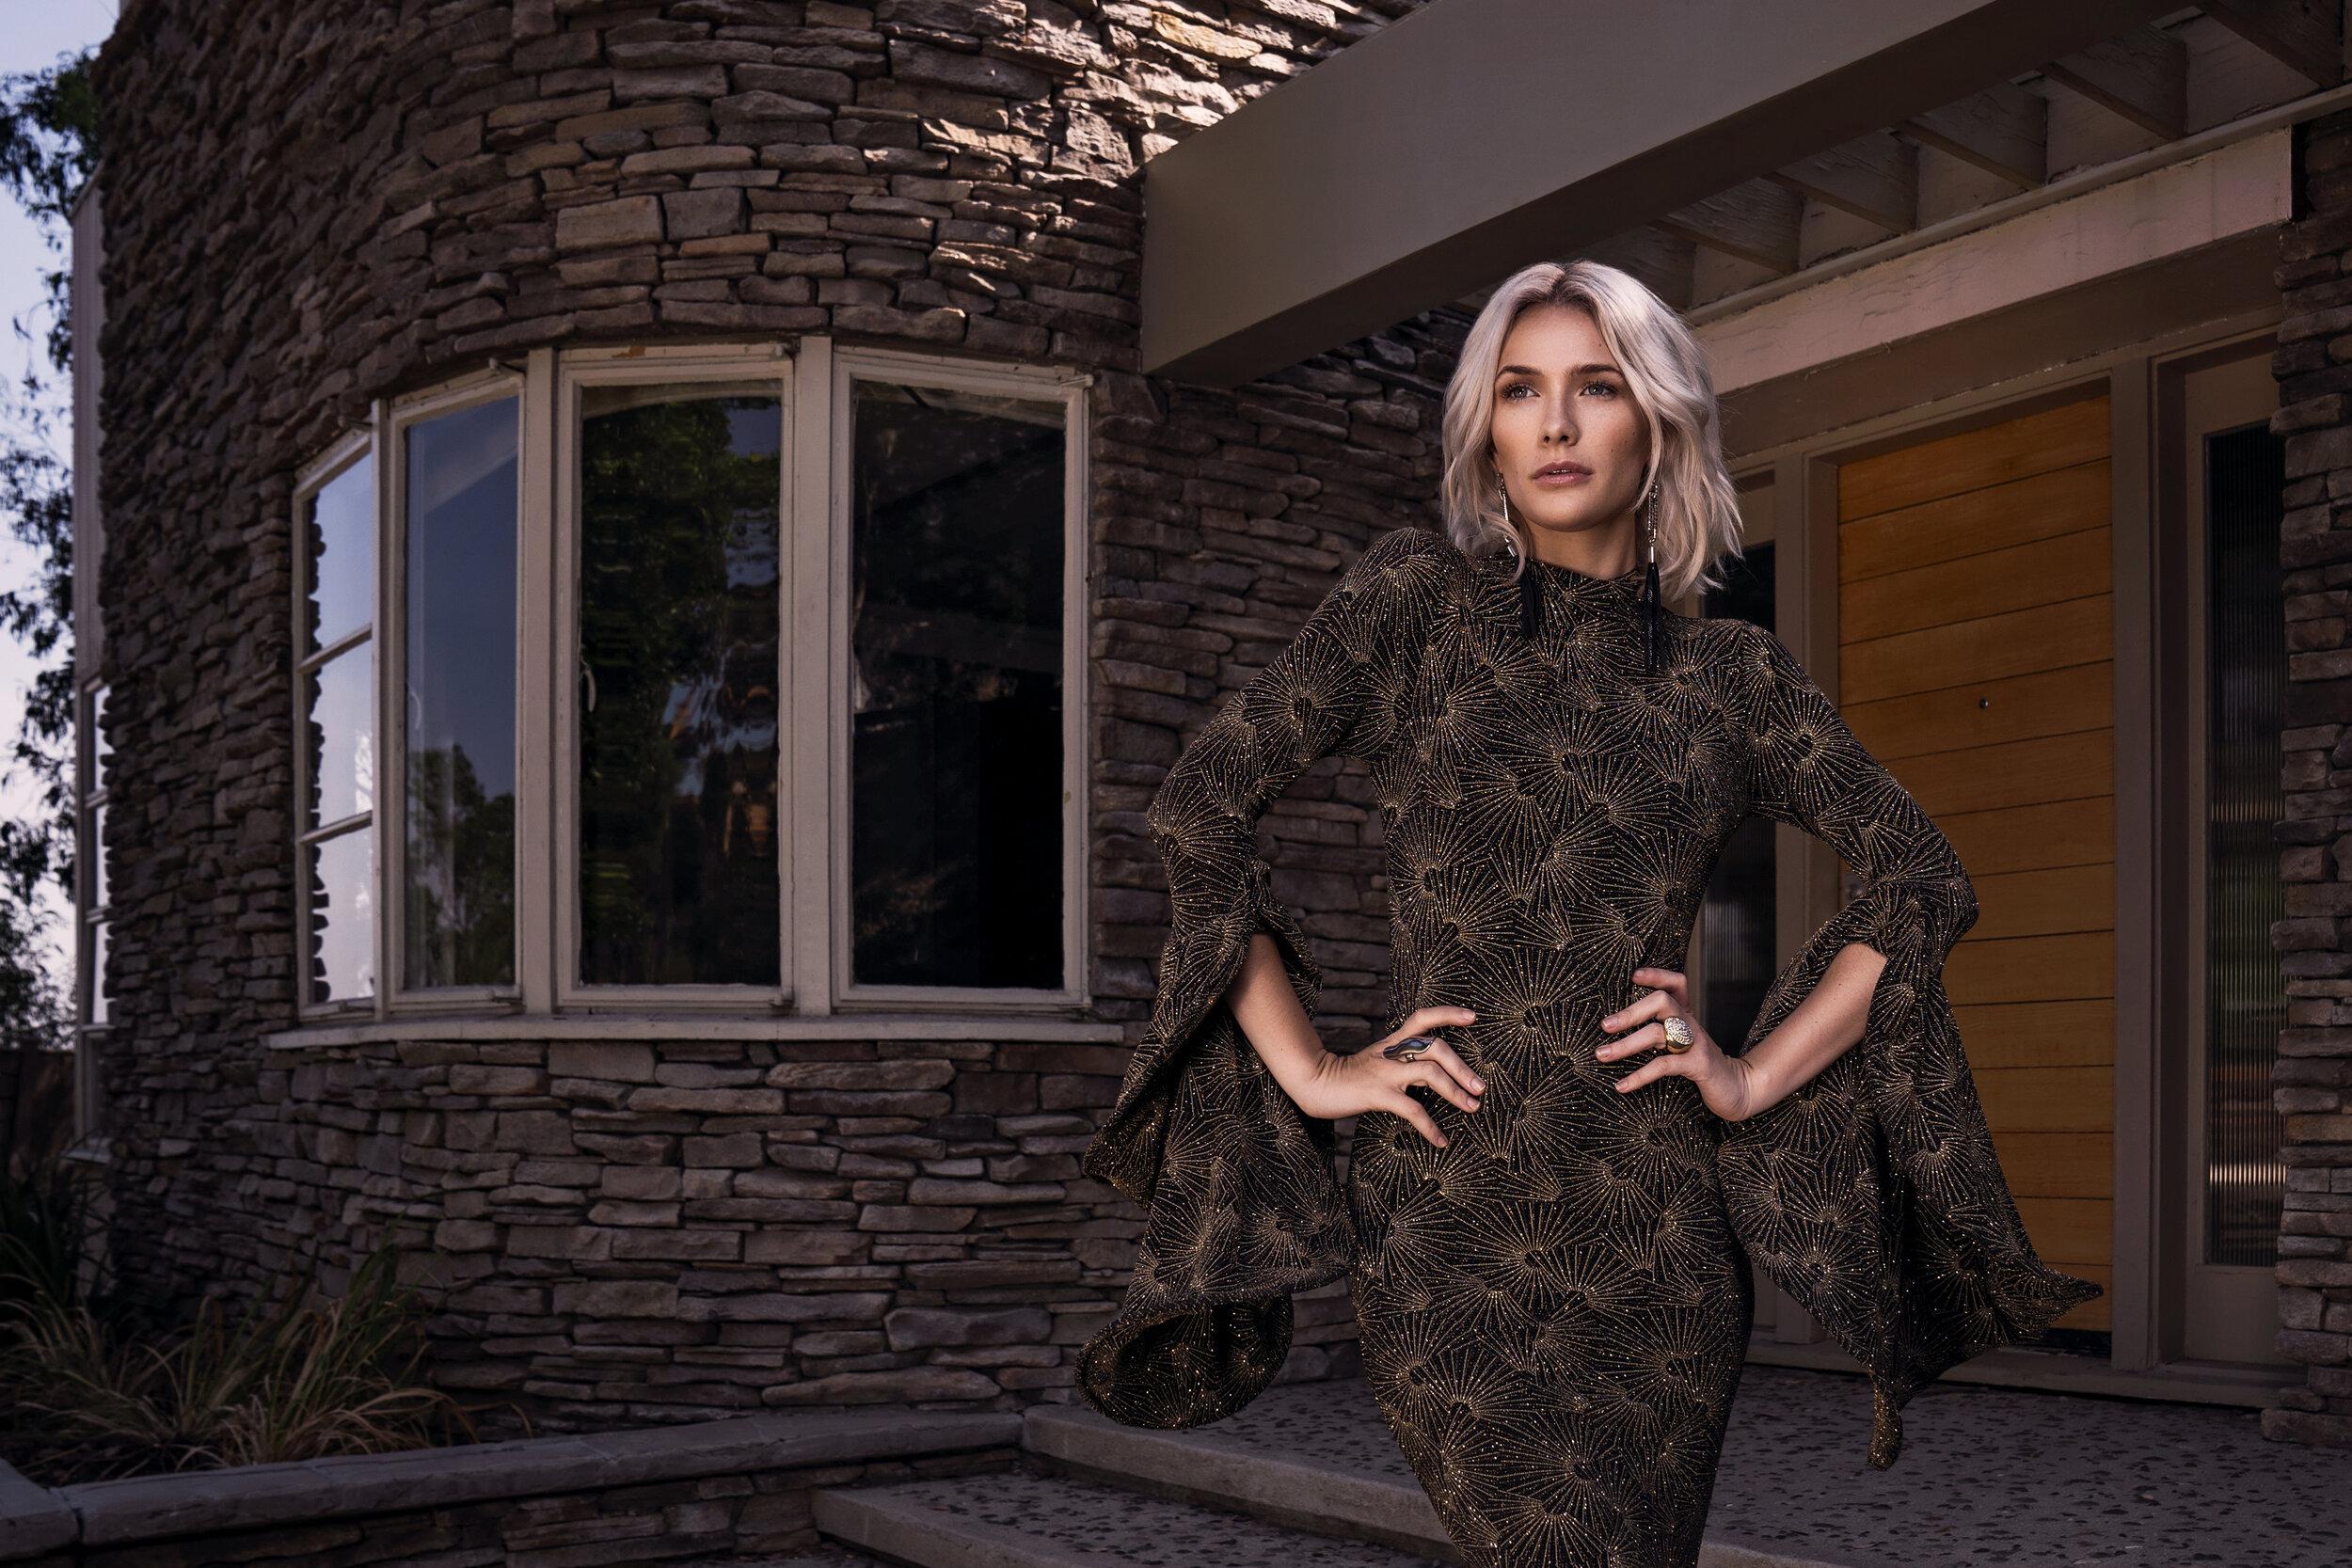 Jordan-Gala-Dress-Gifted-Mindset-Photography-2.jpg